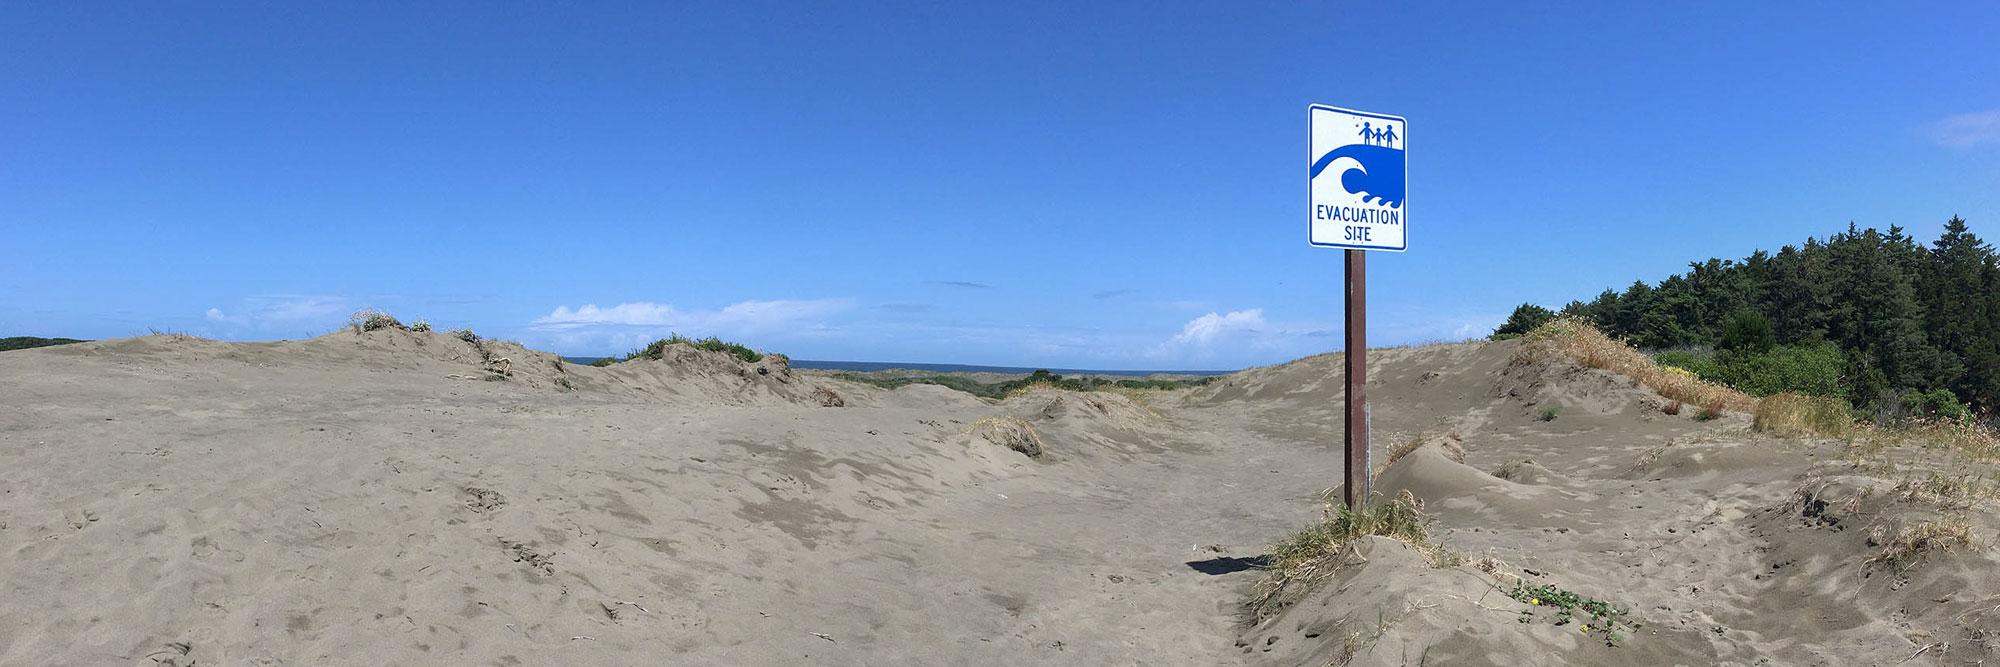 malel dunes